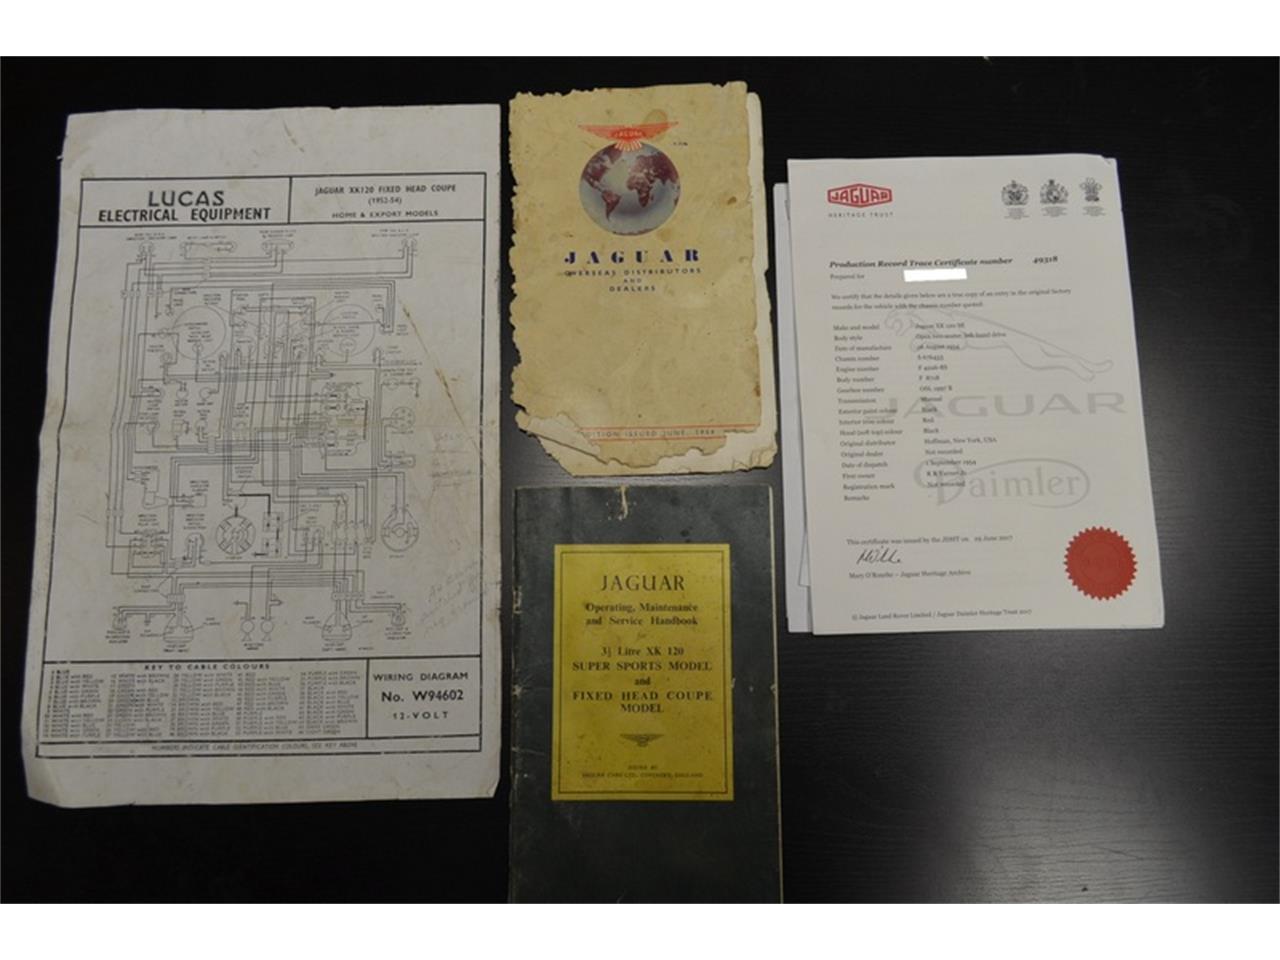 1954 Jaguar Wiring Diagram Expert Schematics Xj6 Xk120 For Sale Classiccars Com Cc 1071922 1997